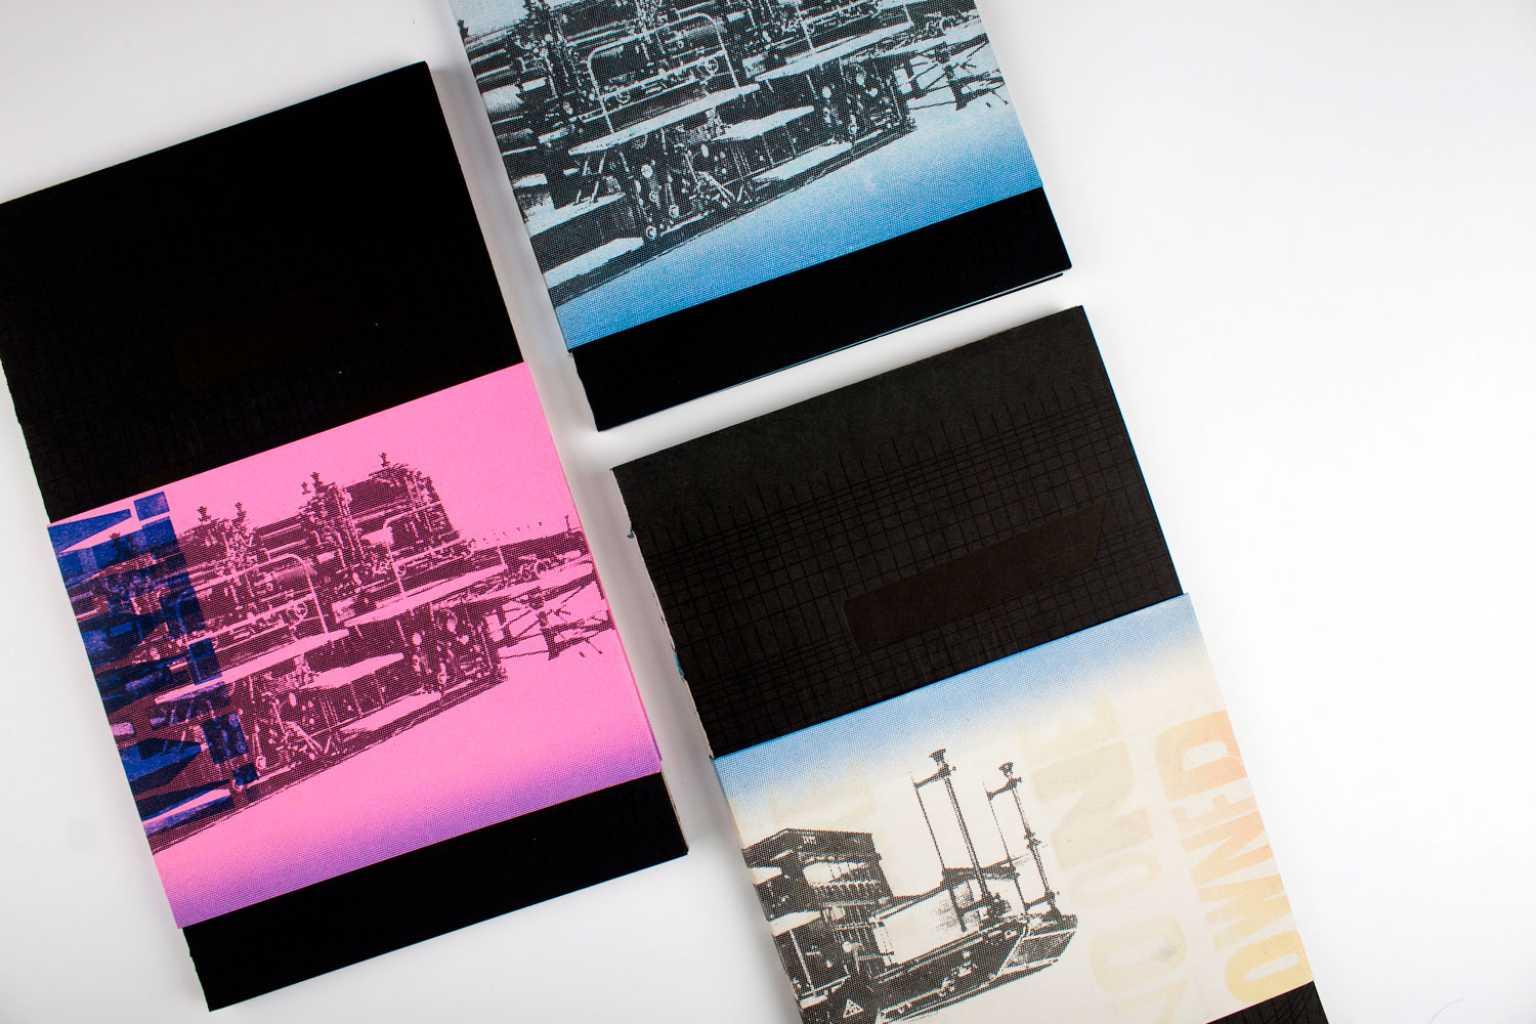 Print + Printer covers